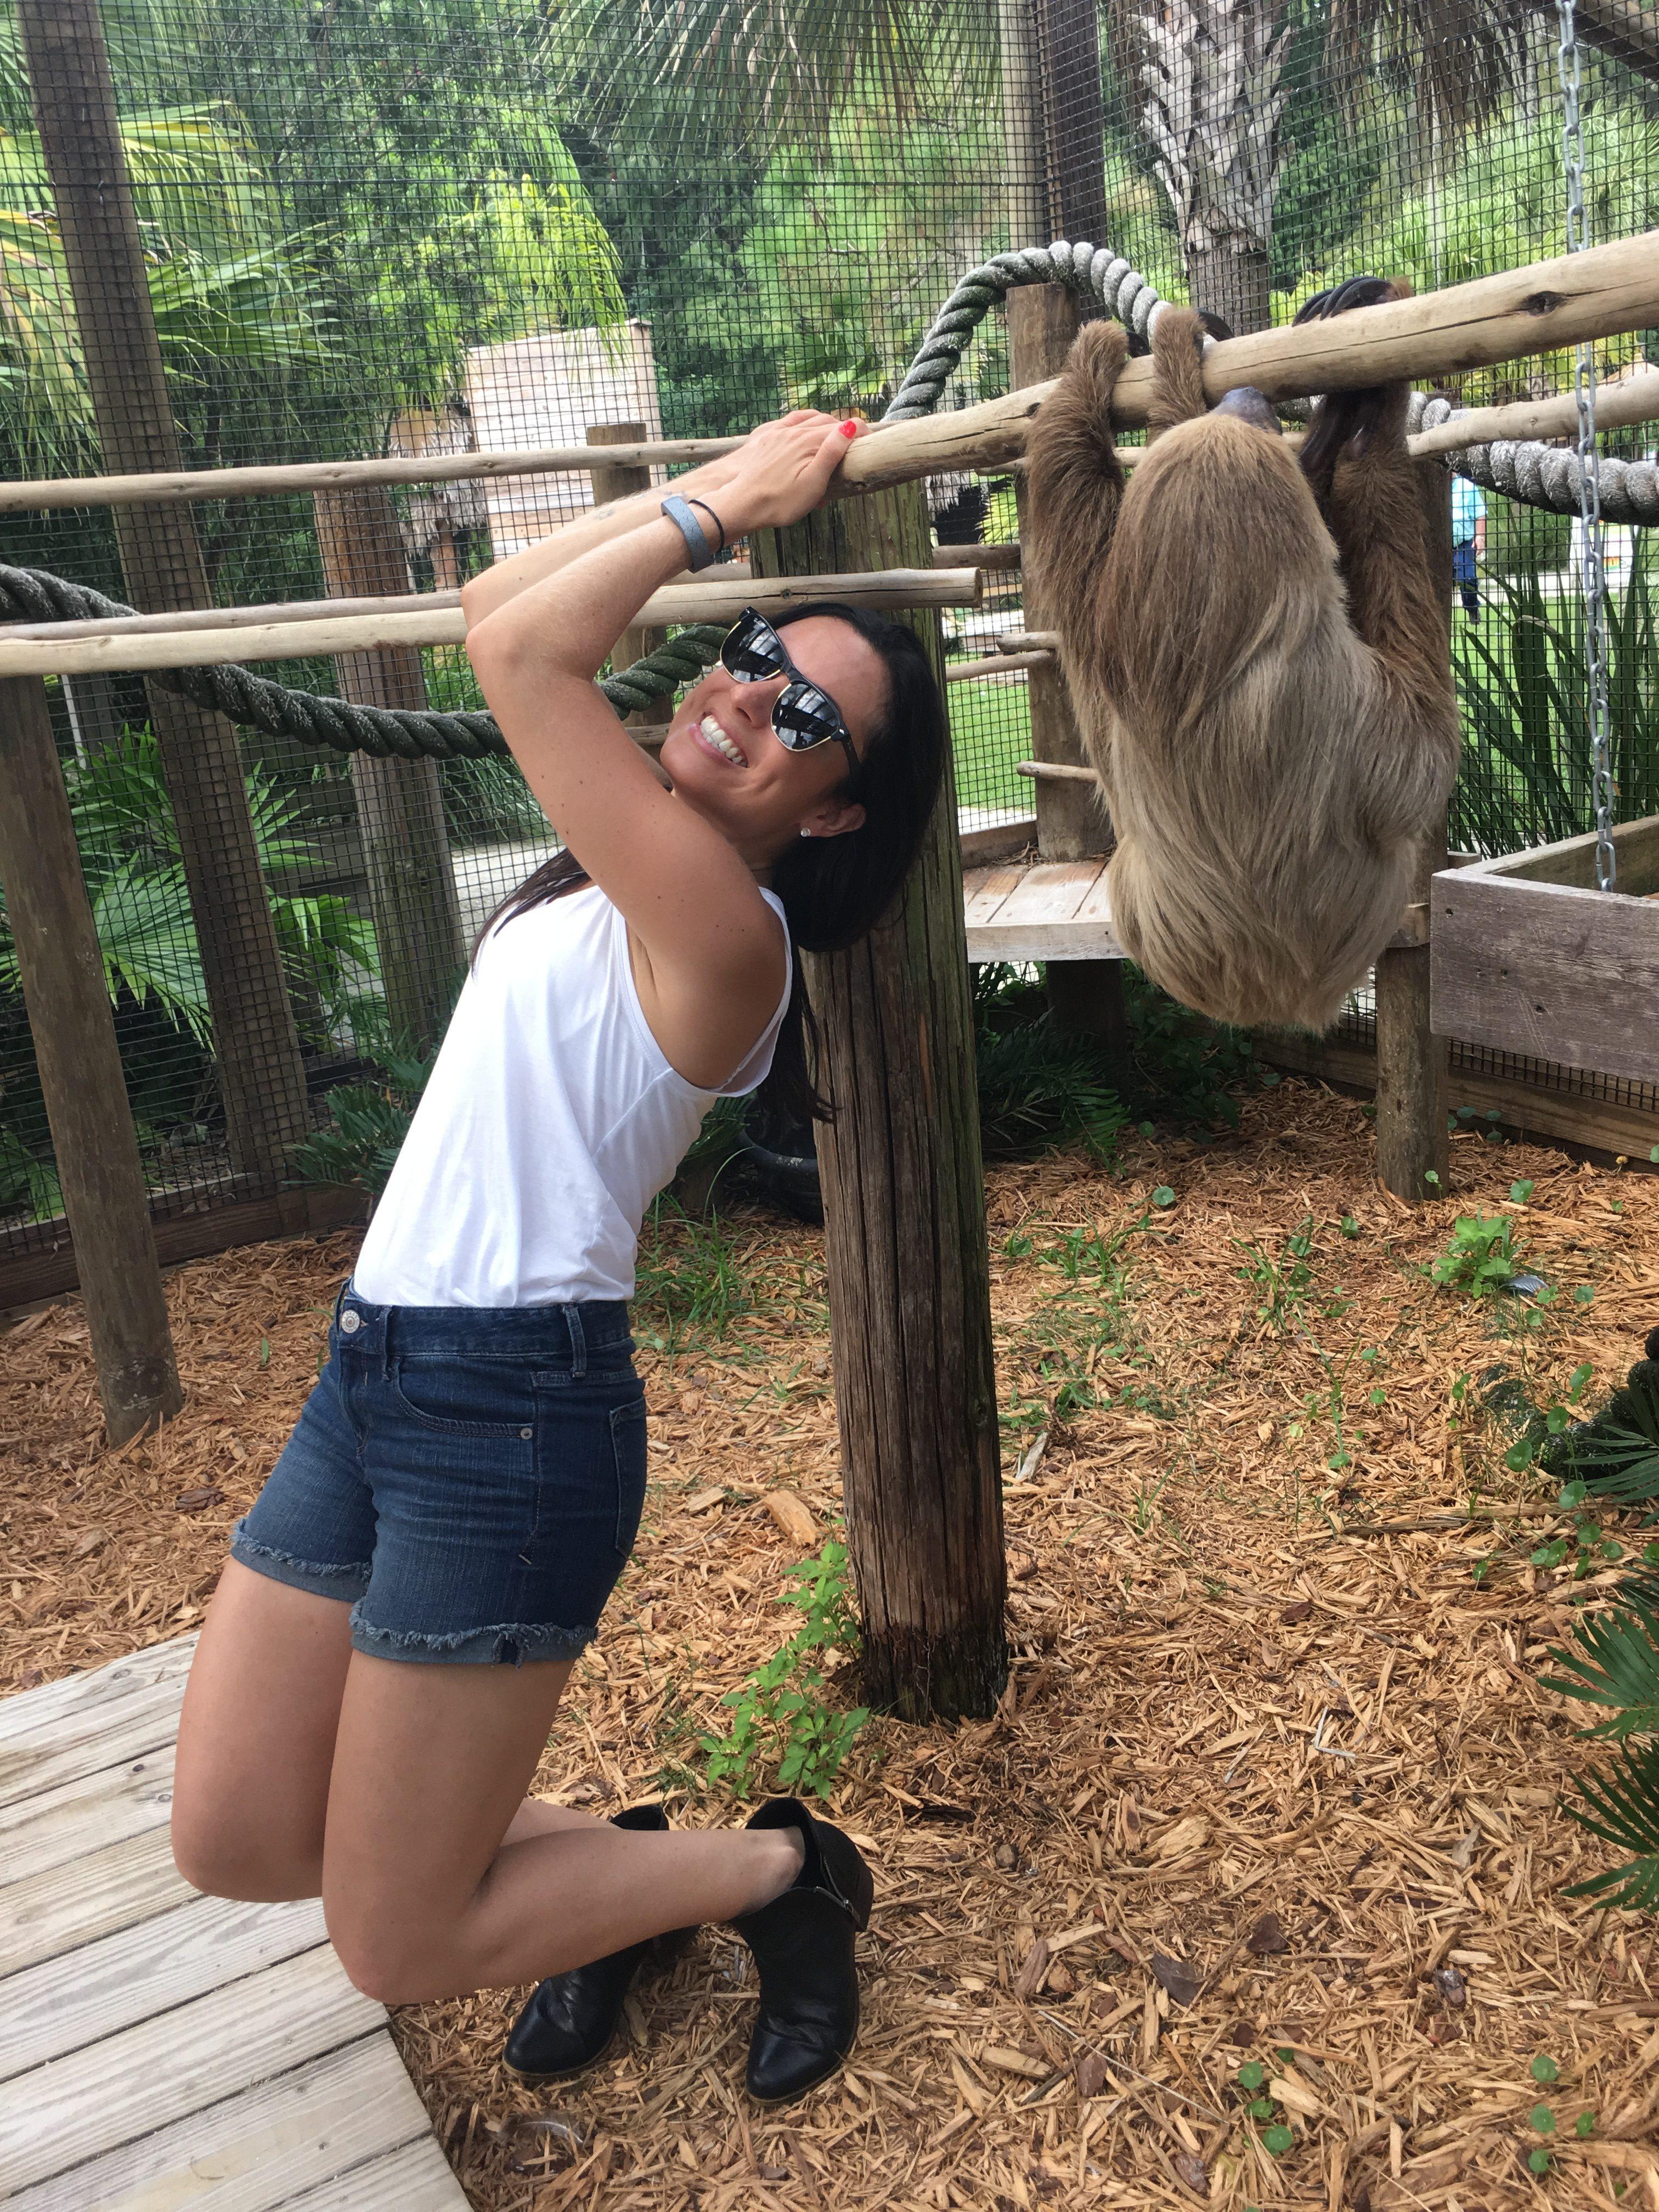 Zoológico em Kissimmee